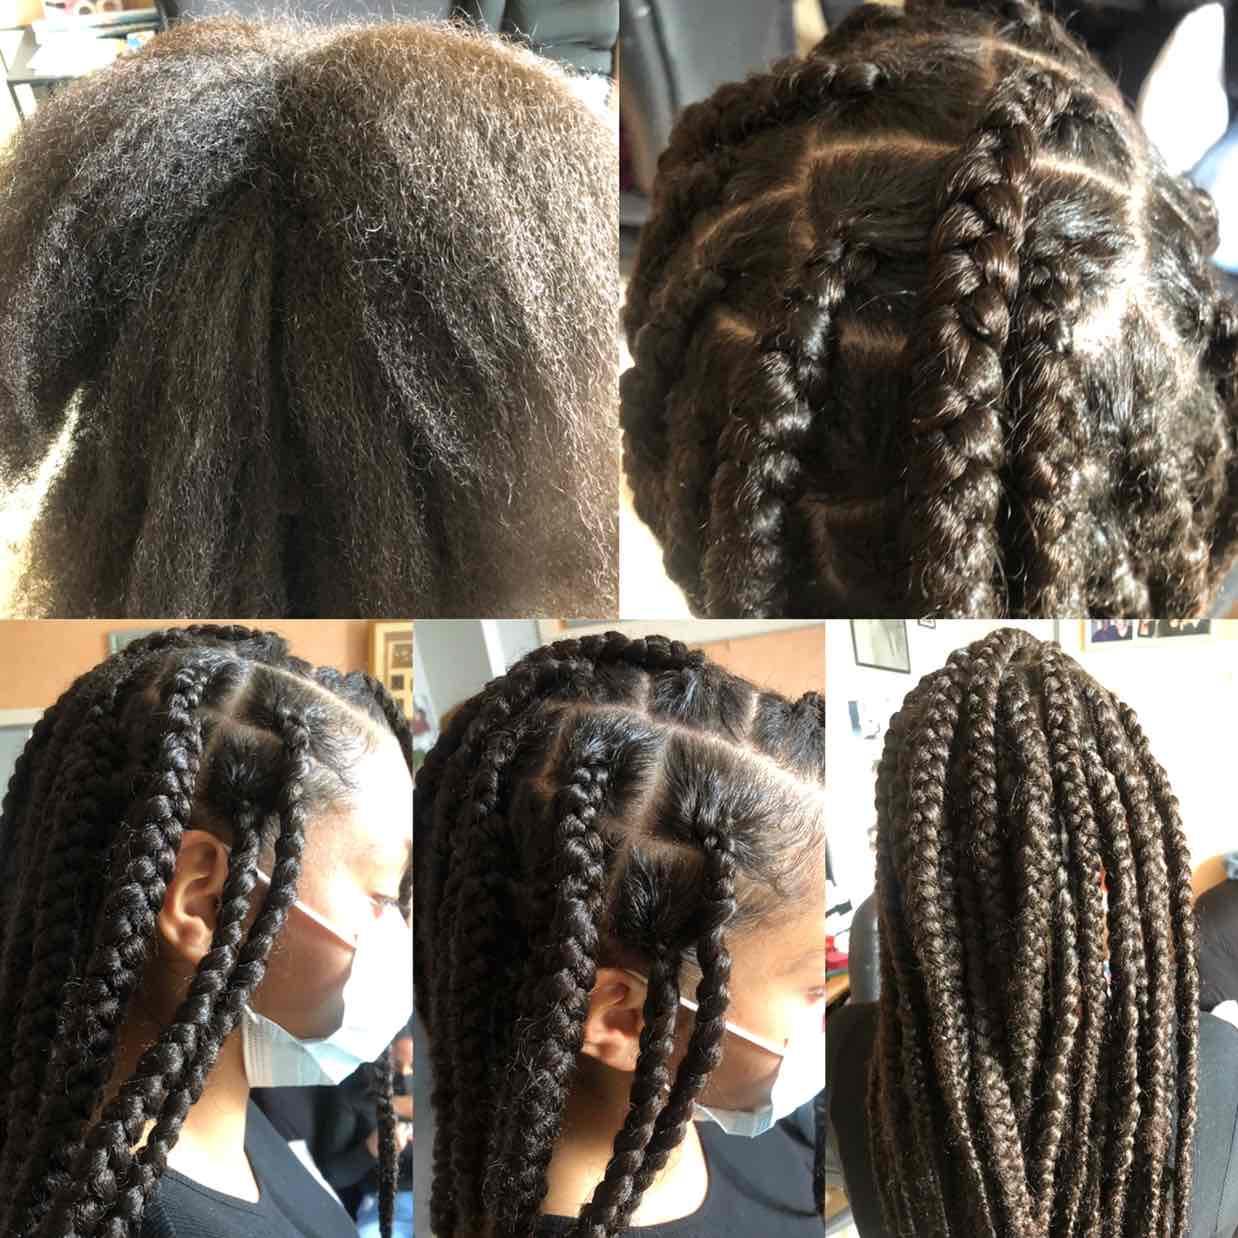 salon de coiffure afro tresse tresses box braids crochet braids vanilles tissages paris 75 77 78 91 92 93 94 95 JOJRUEVU